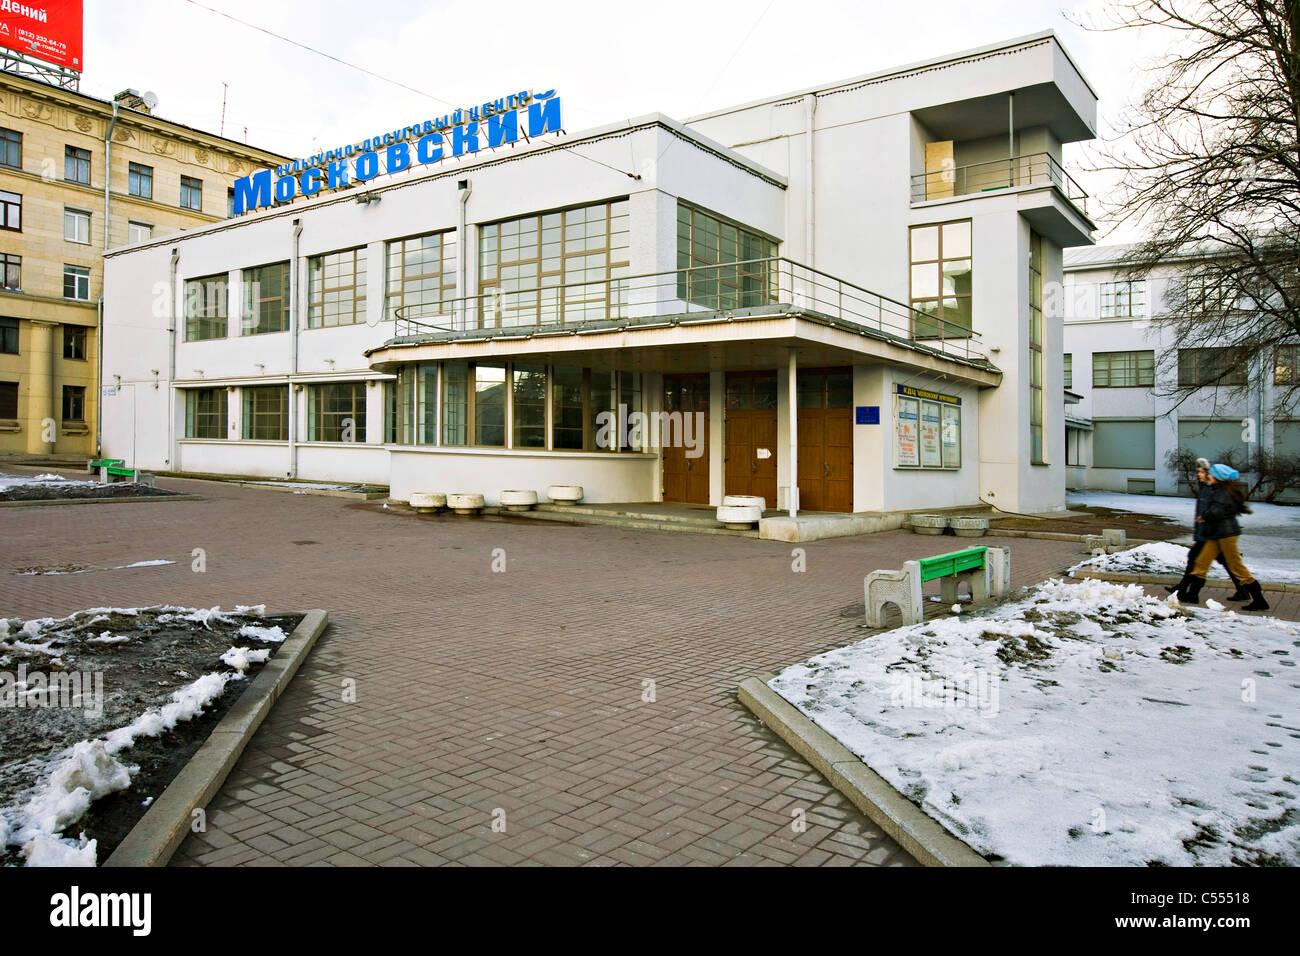 Konstruktivismus Architektur: Russian Soviet Constructivist Architecture St Petersburg